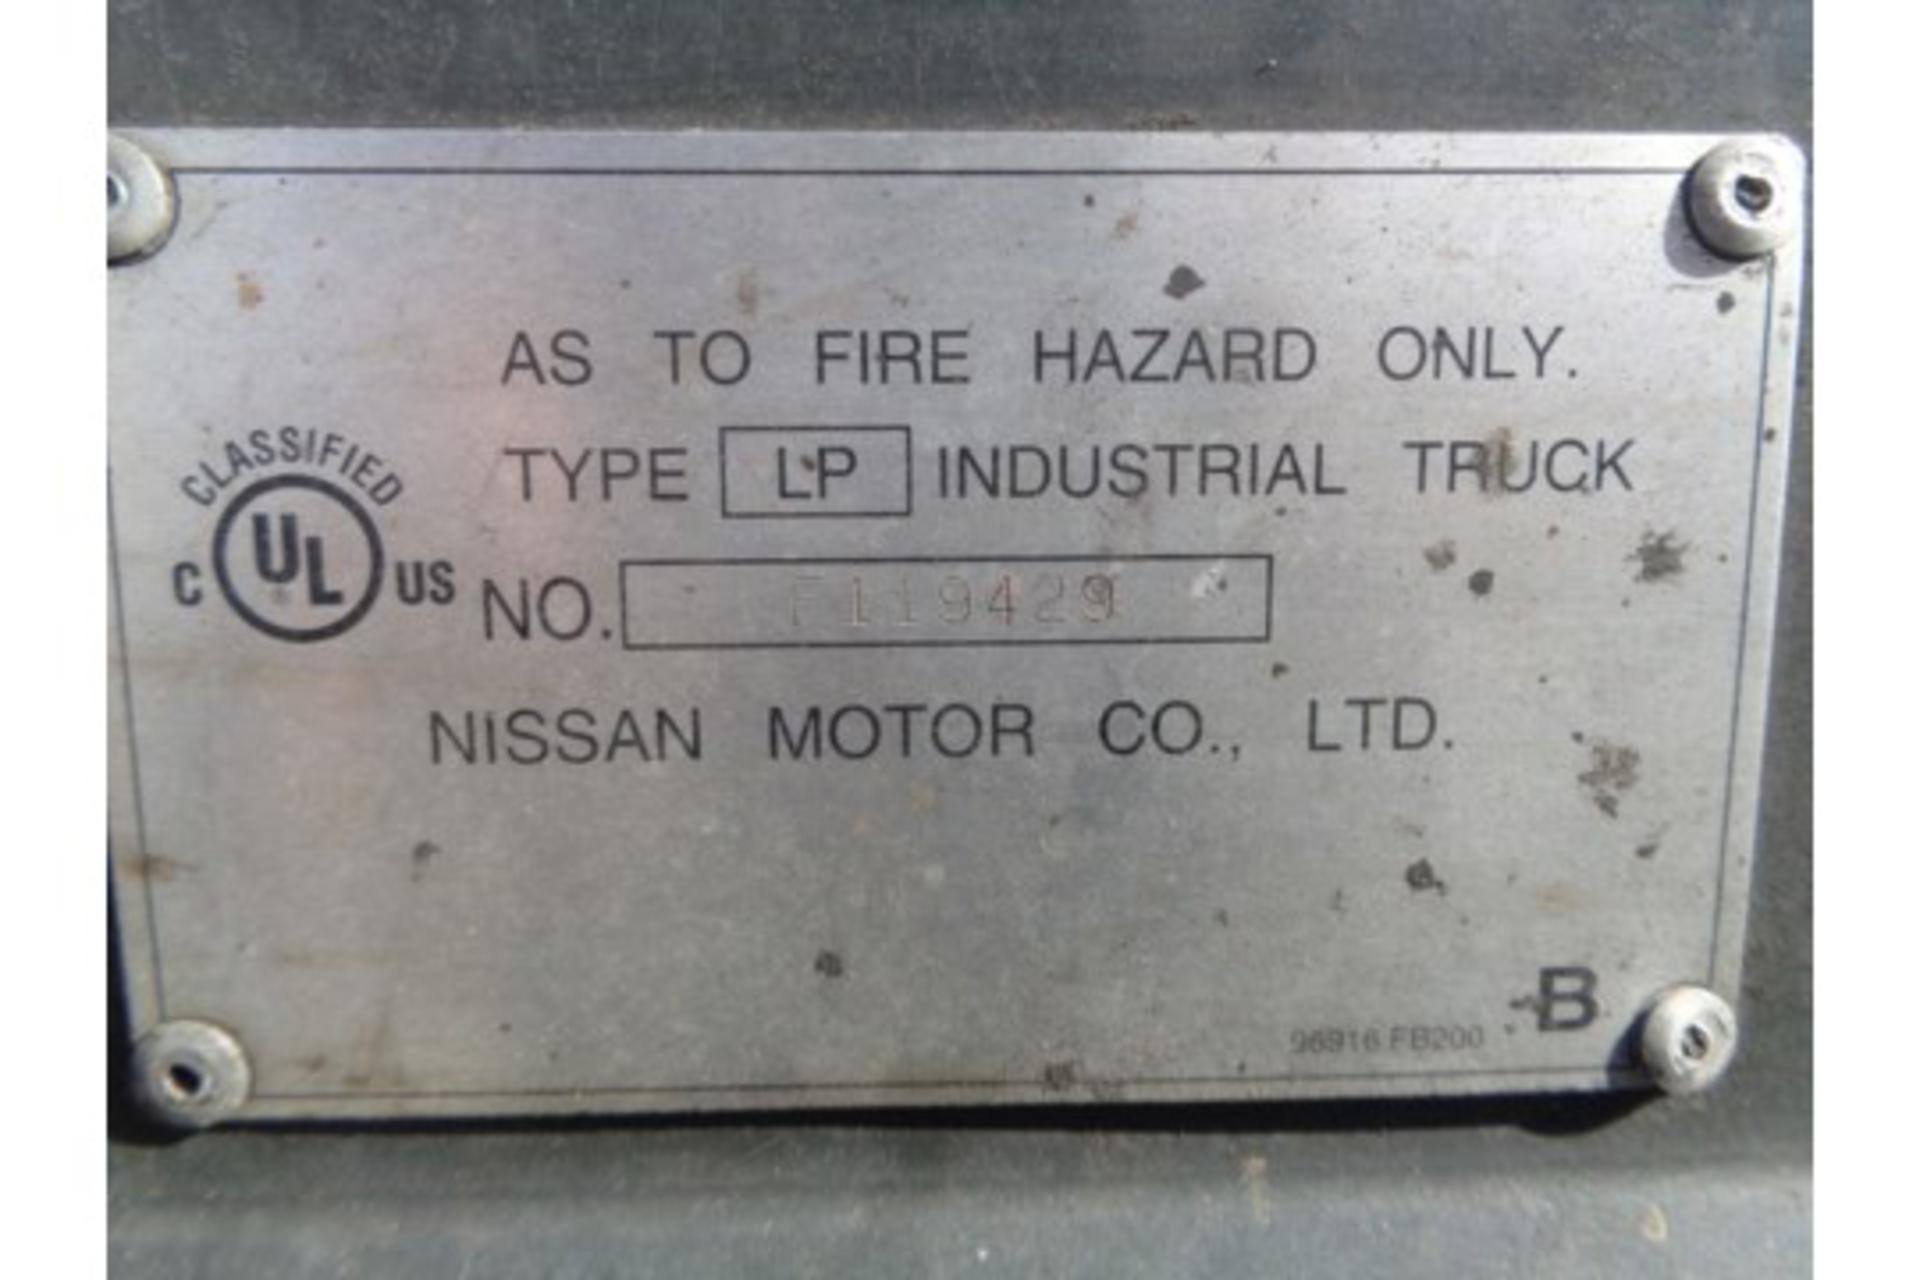 Nissan MCPL01A18LV 3500lb Forklift - Image 15 of 16